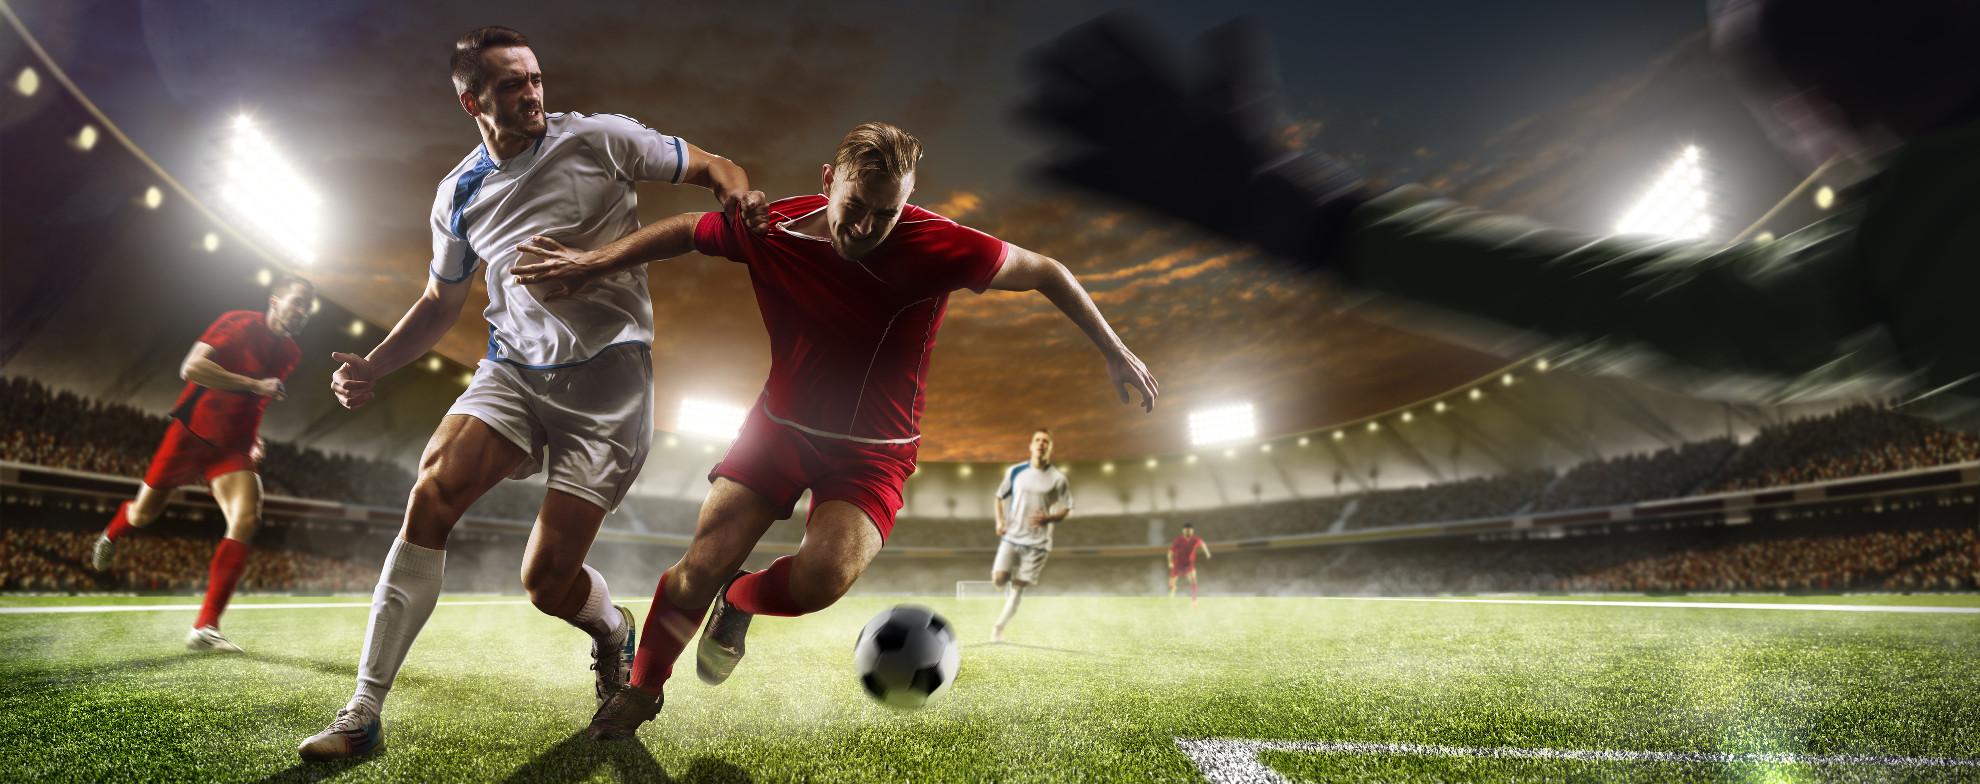 Fußball-WM 2018 Technik mieten in Berlin